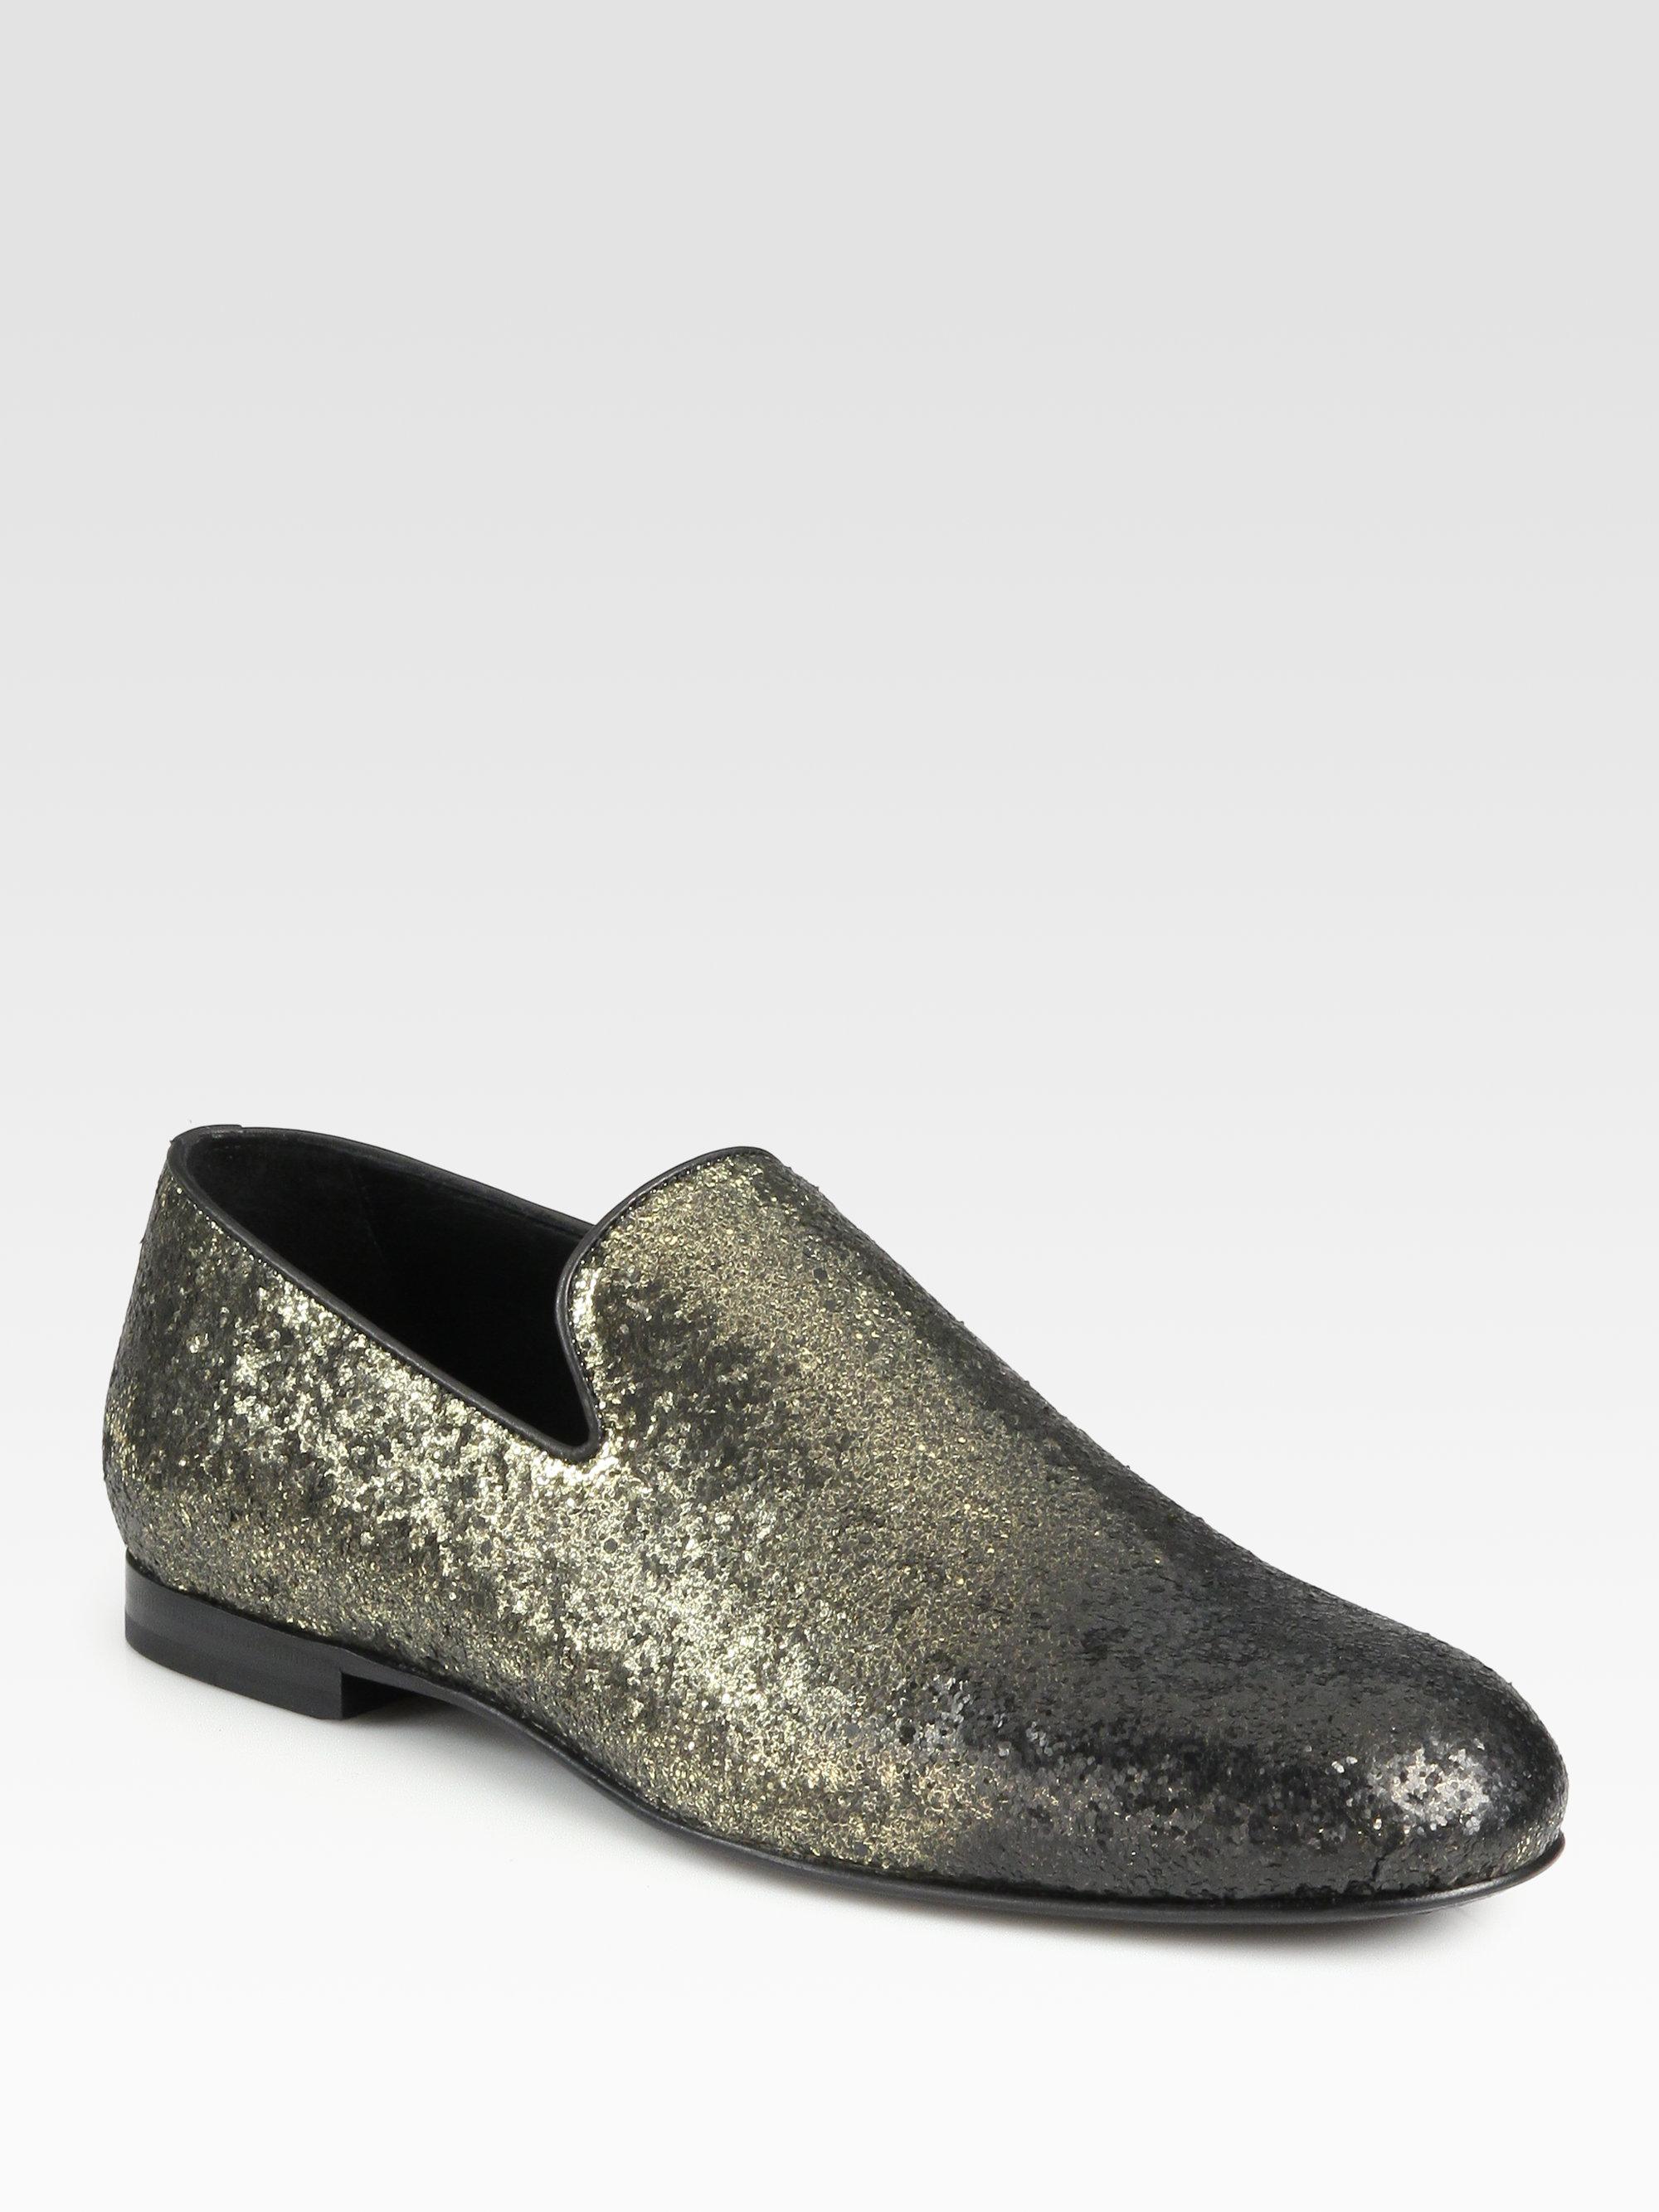 aff7a5f9bfc Lyst - Jimmy Choo Sloane Glitter Slipper Loafers in Metallic for Men